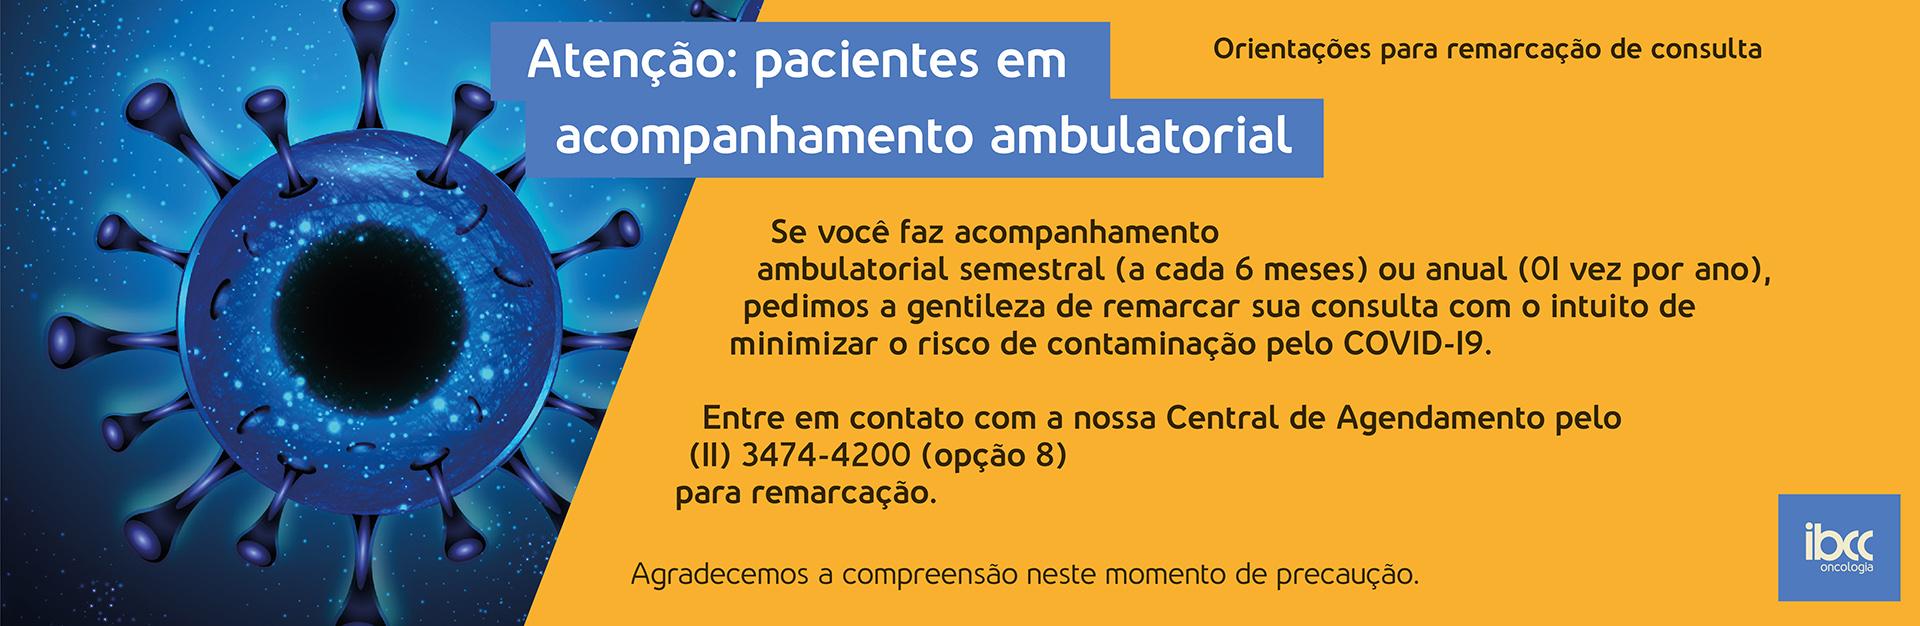 Coronavirus atenção pacientes